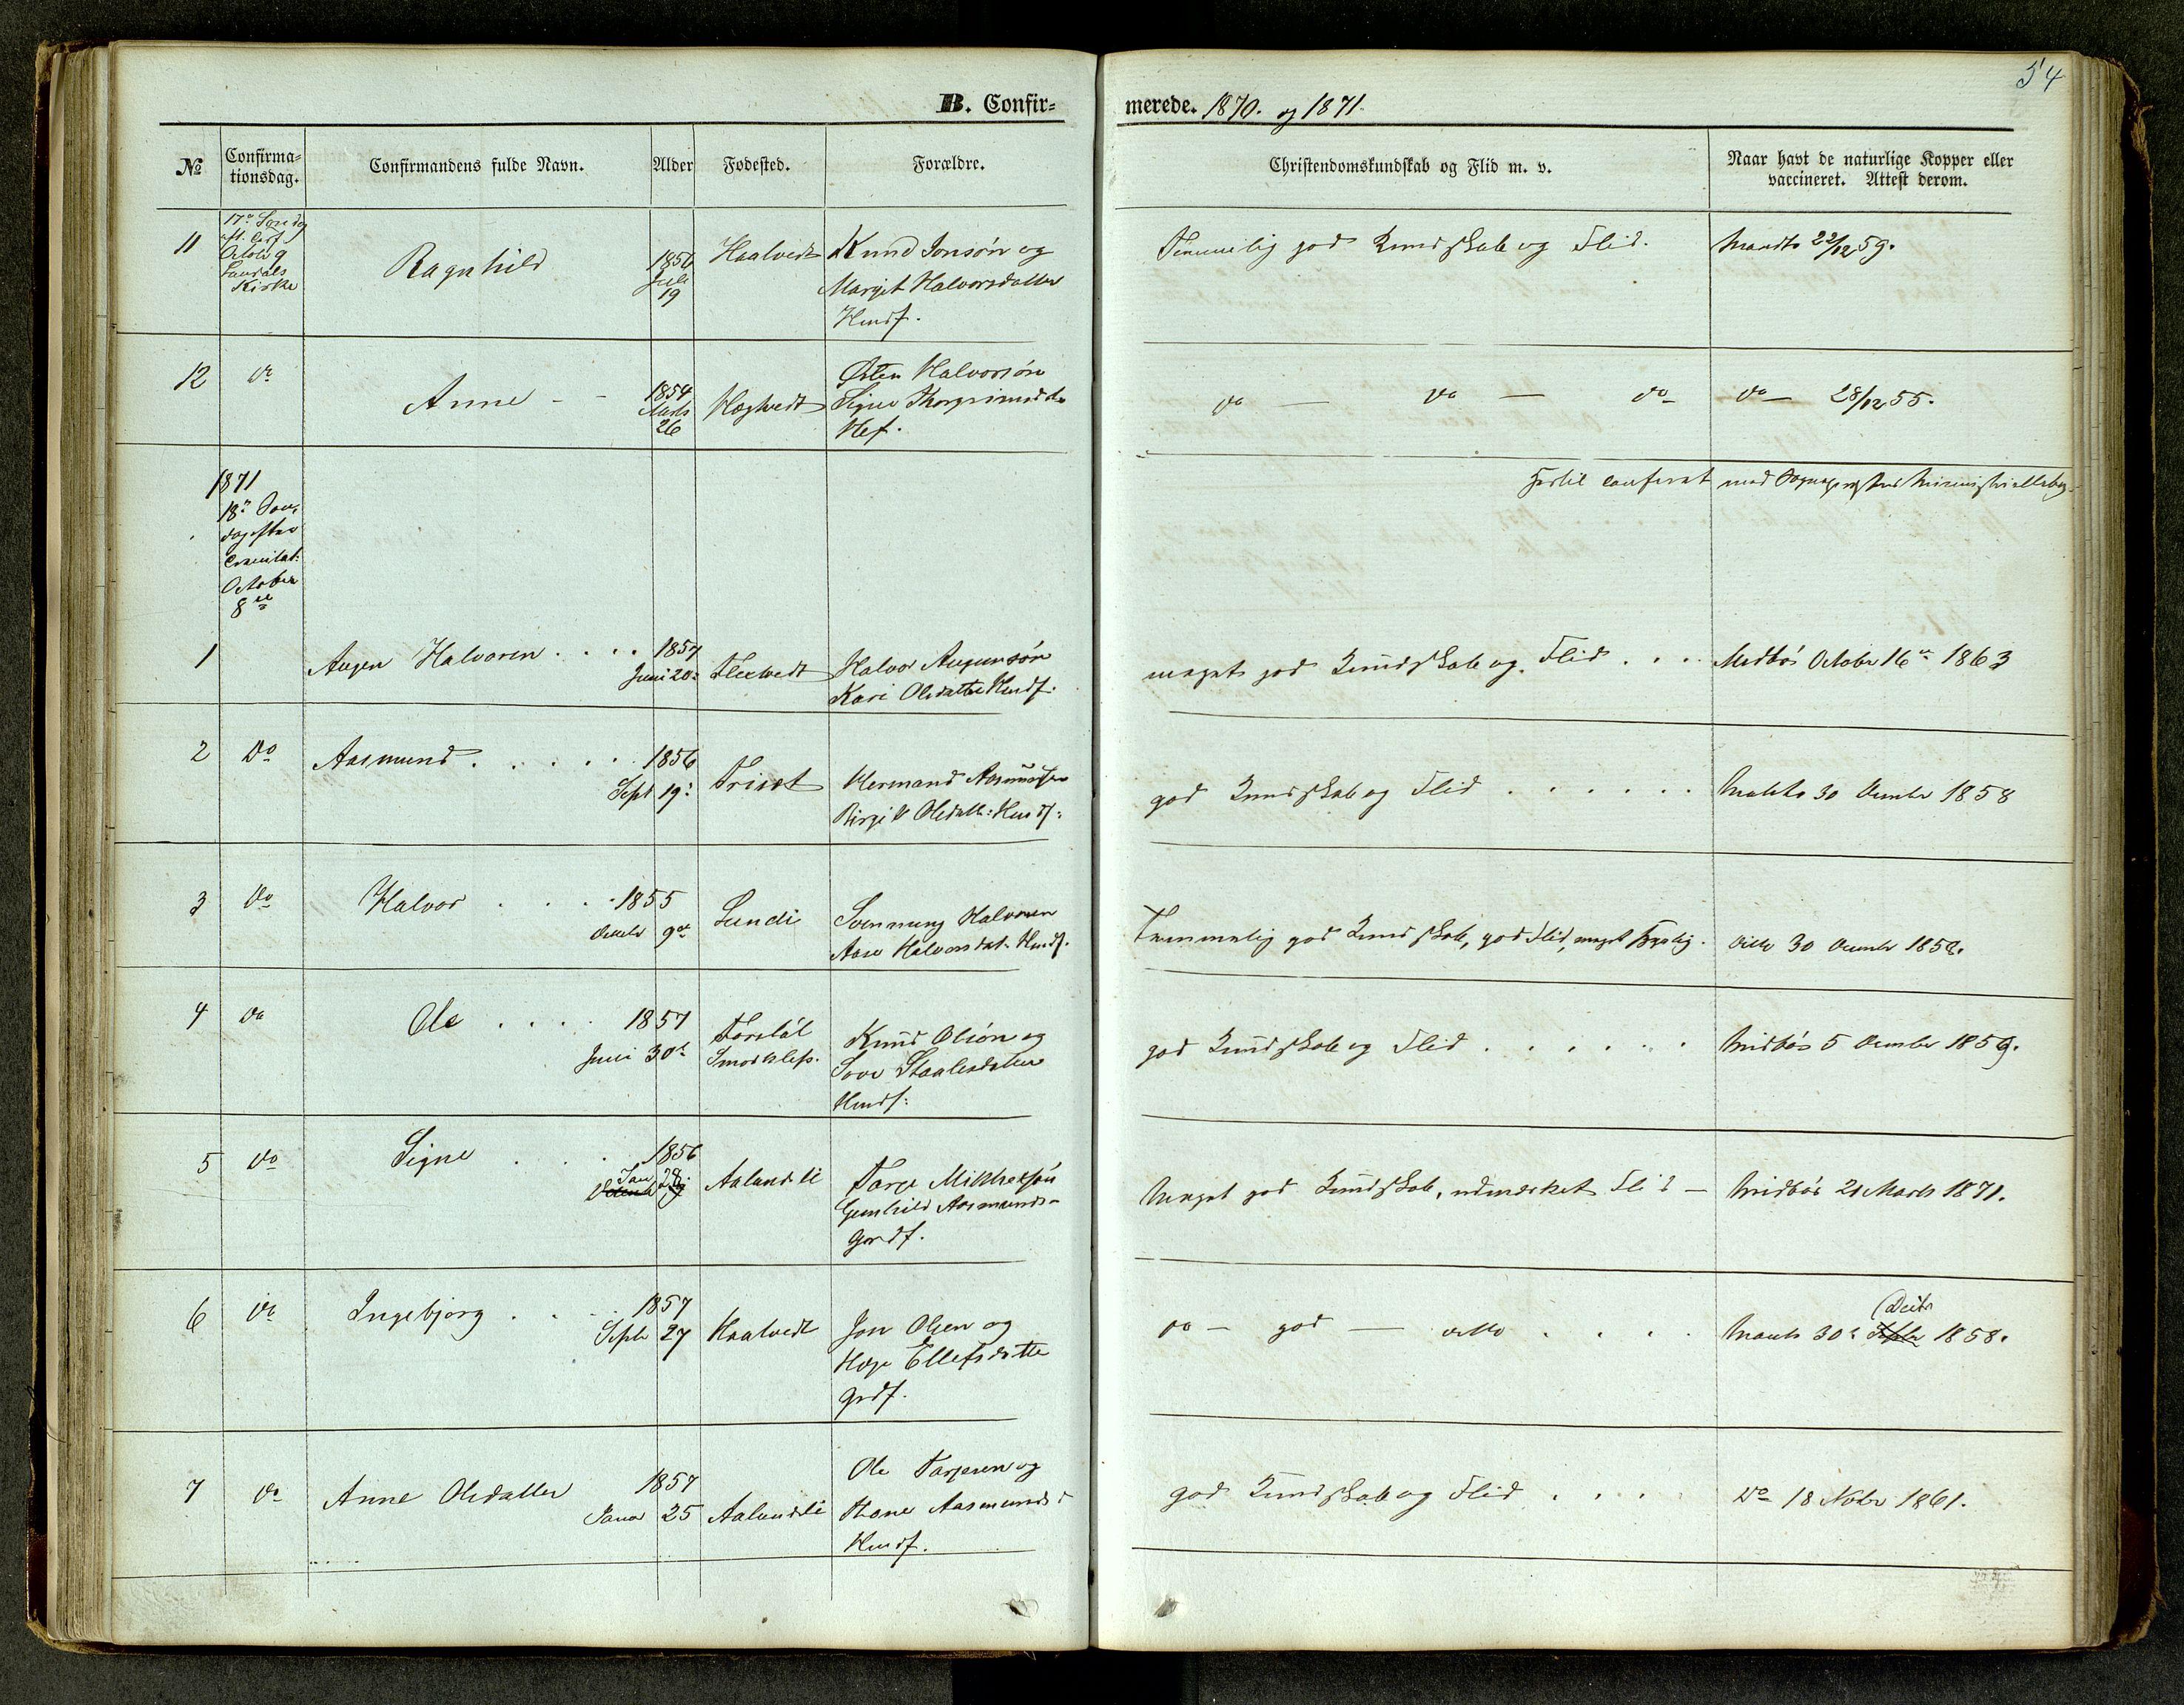 SAKO, Lårdal kirkebøker, G/Ga/L0002: Klokkerbok nr. I 2, 1861-1890, s. 54